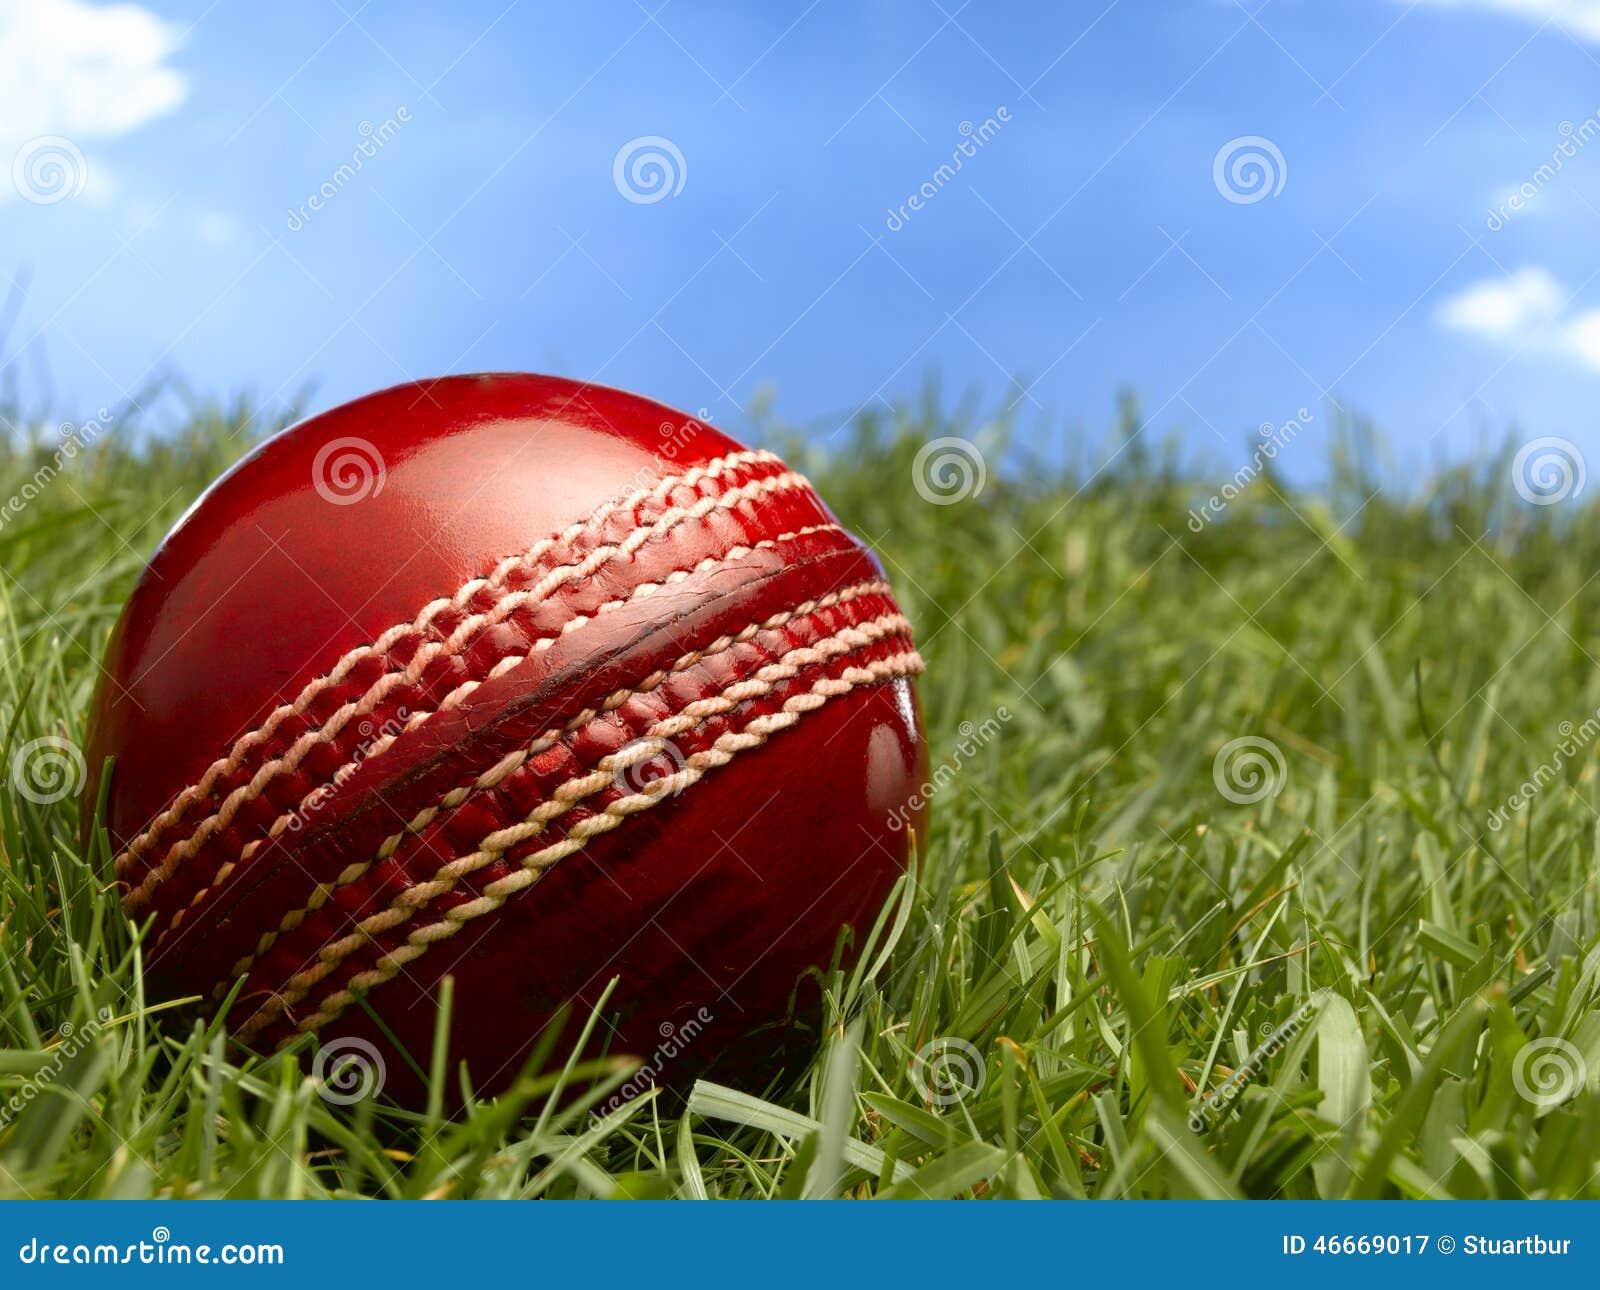 Cork Ball Cricket Bat: Cricket Ball Royalty-Free Stock Photo